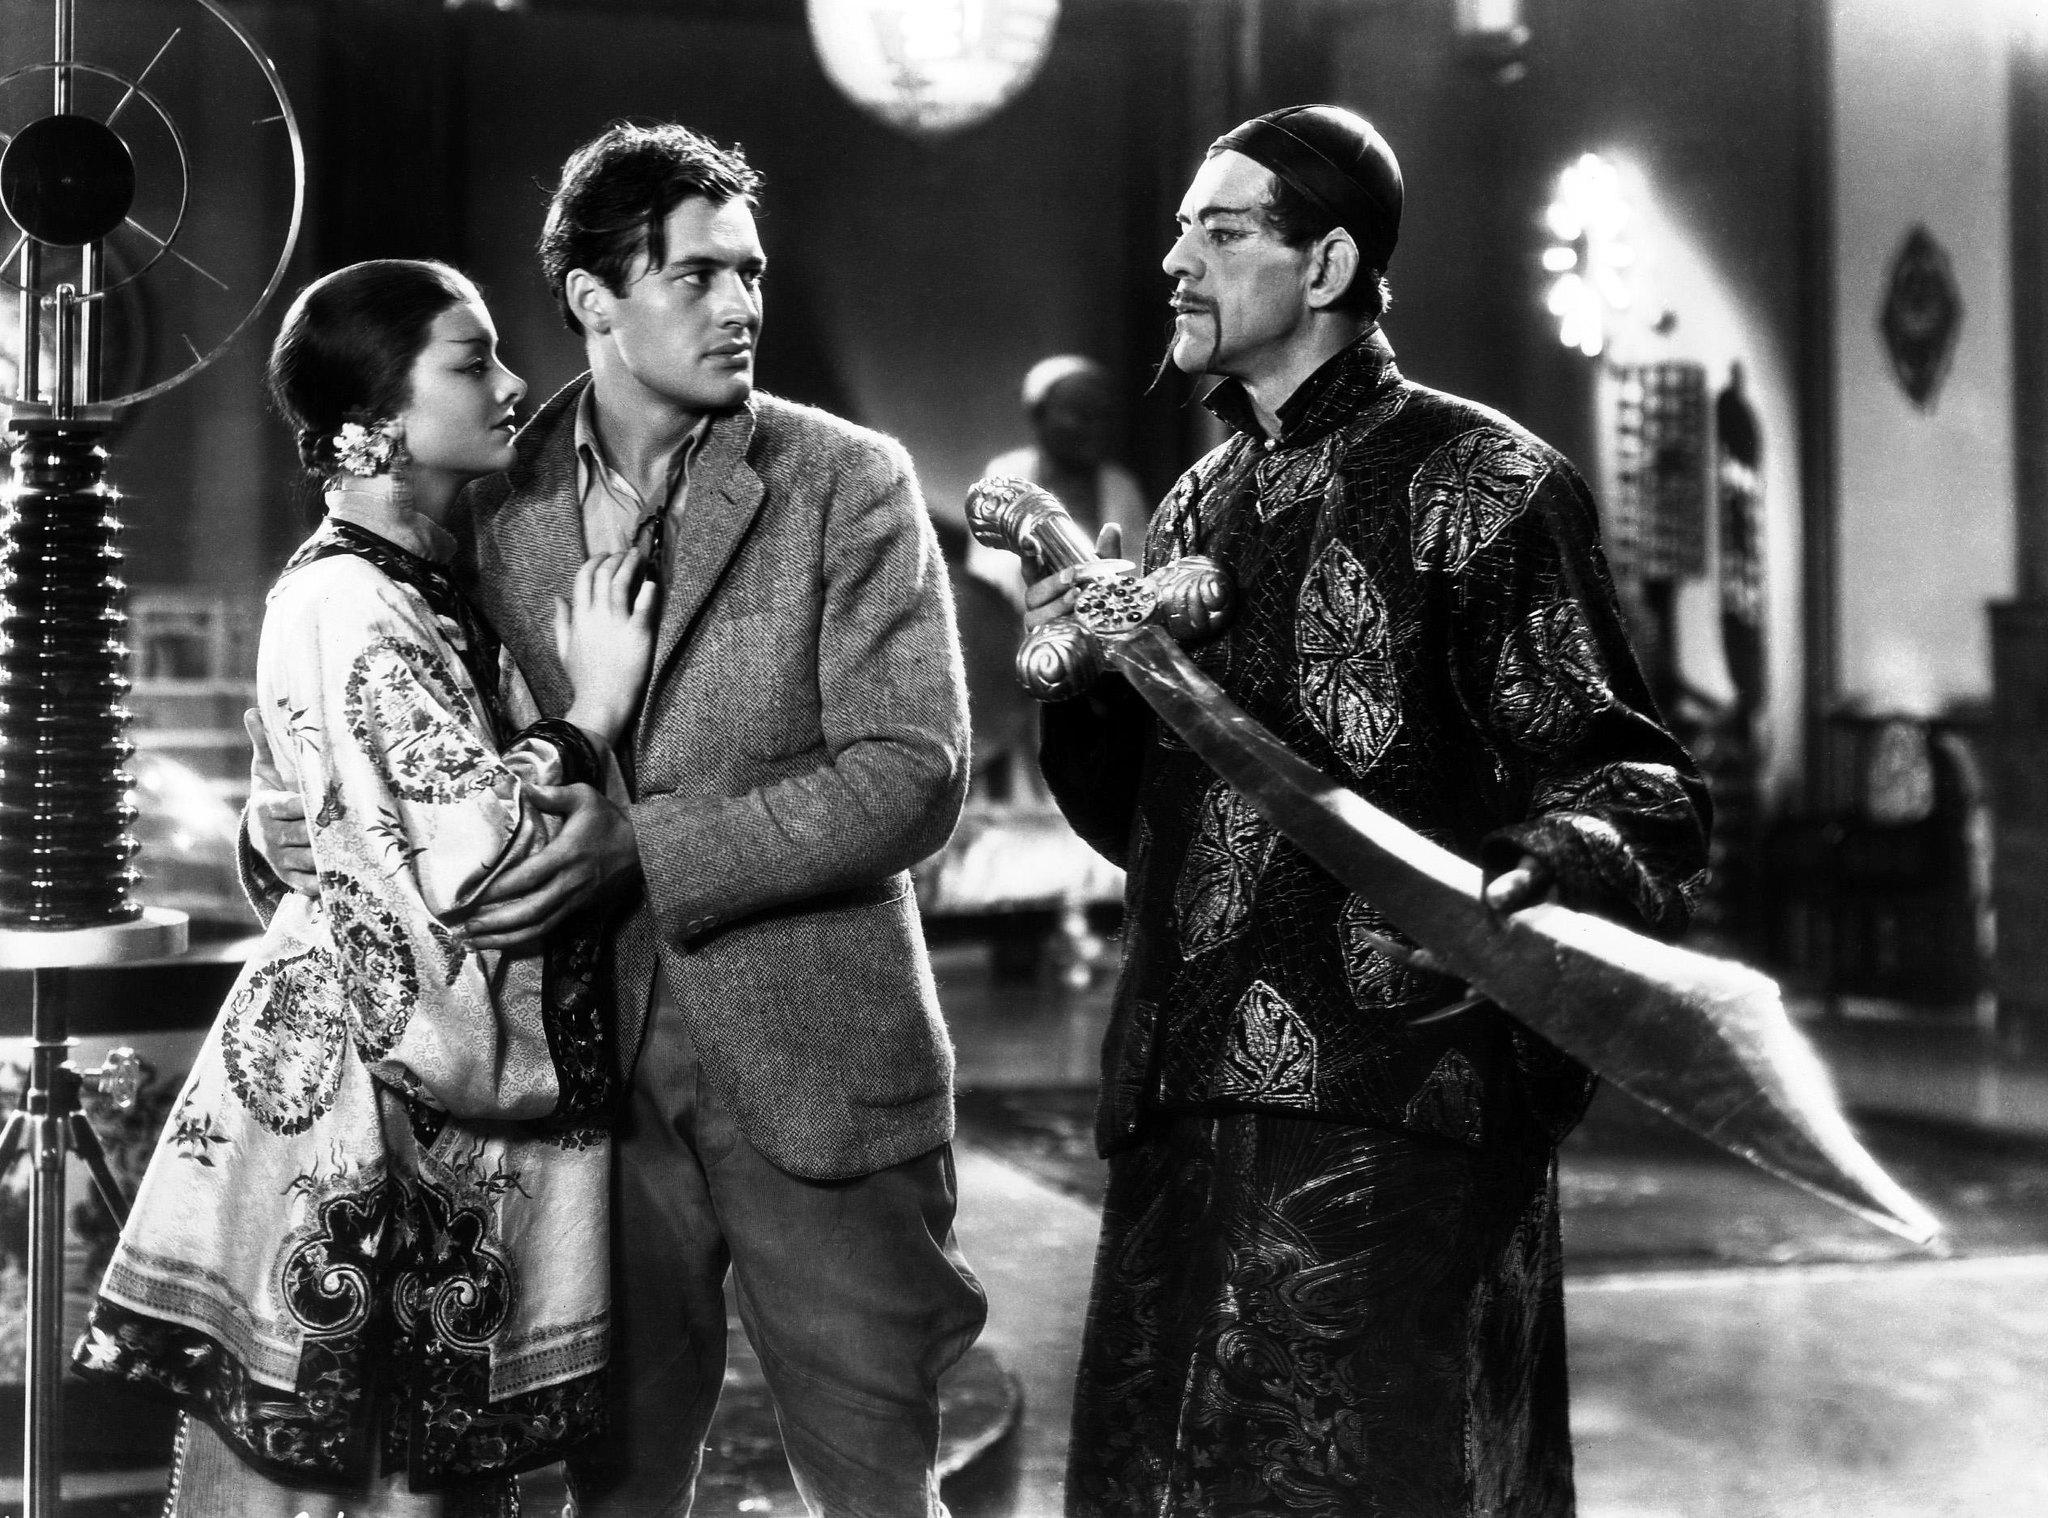 Myrna Loy, Charles Starrett et Boris Karloff dans le film Le Masque d'or (1932)